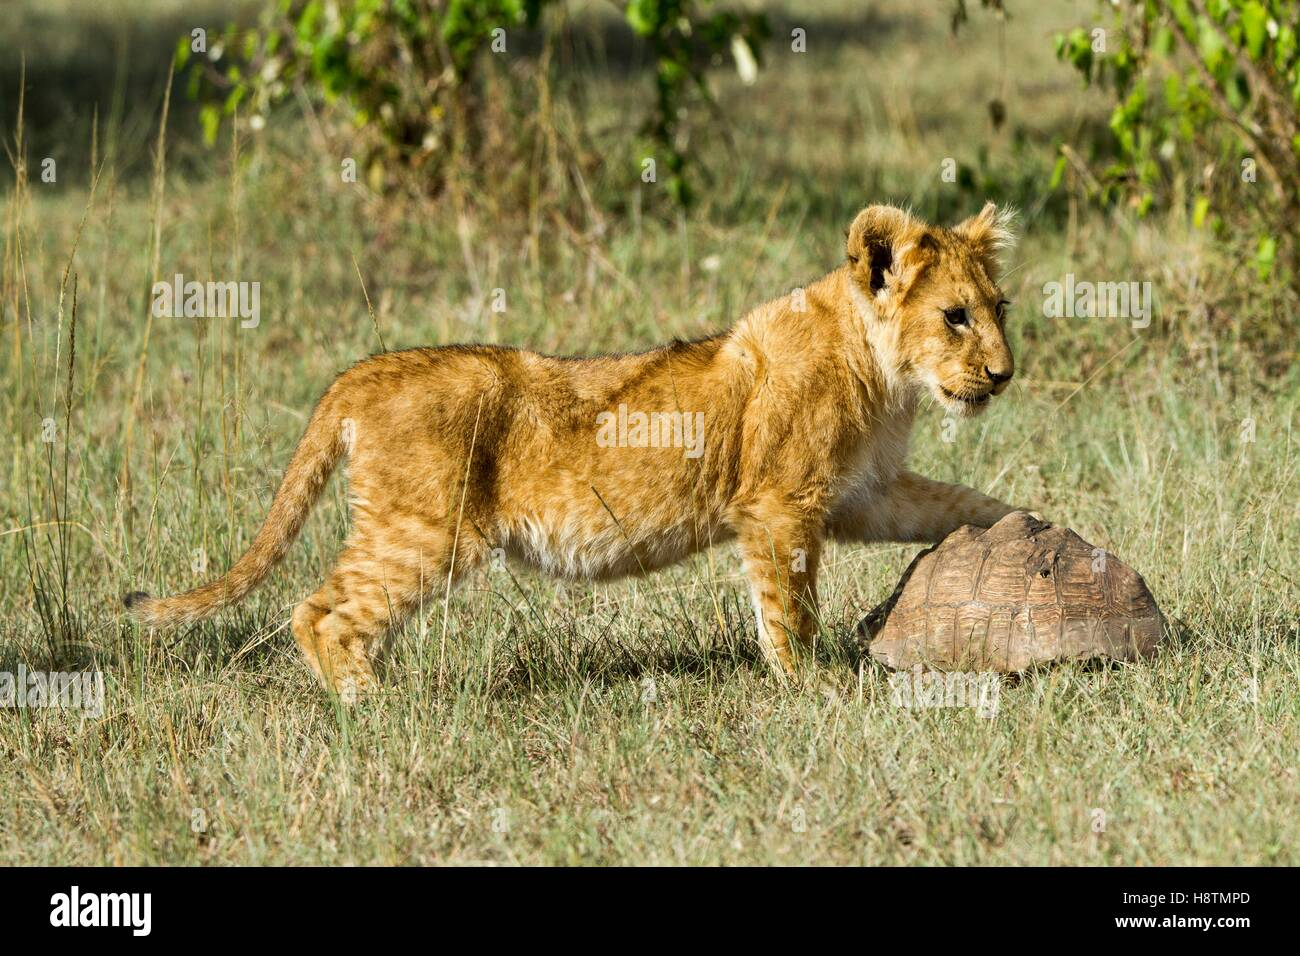 Kenya, Masai-Mara game reserve, Lion (Panthera leo), cub playing with a turtle - Stock Image